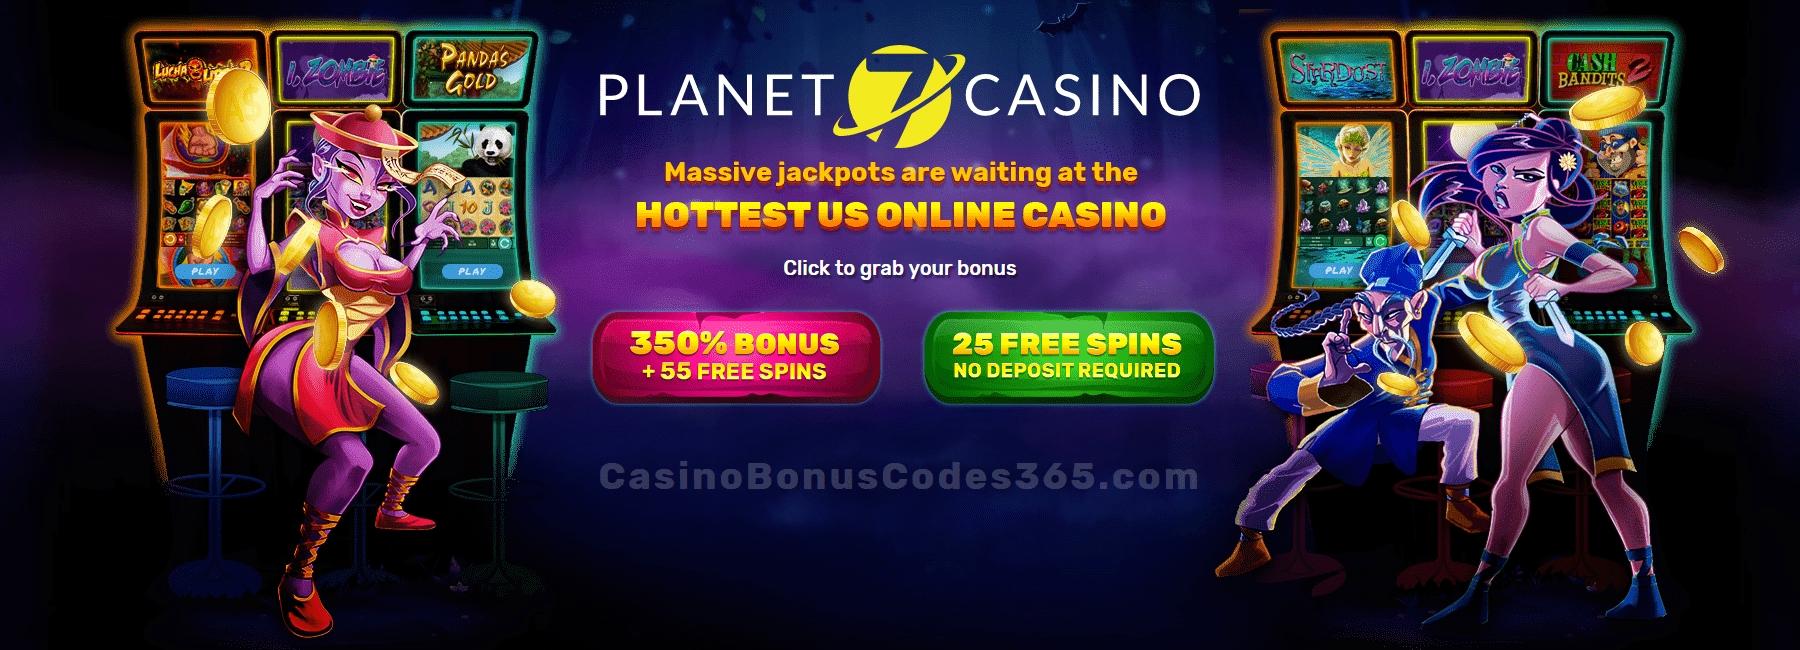 Gamebookers的45%赌场比赛奖金